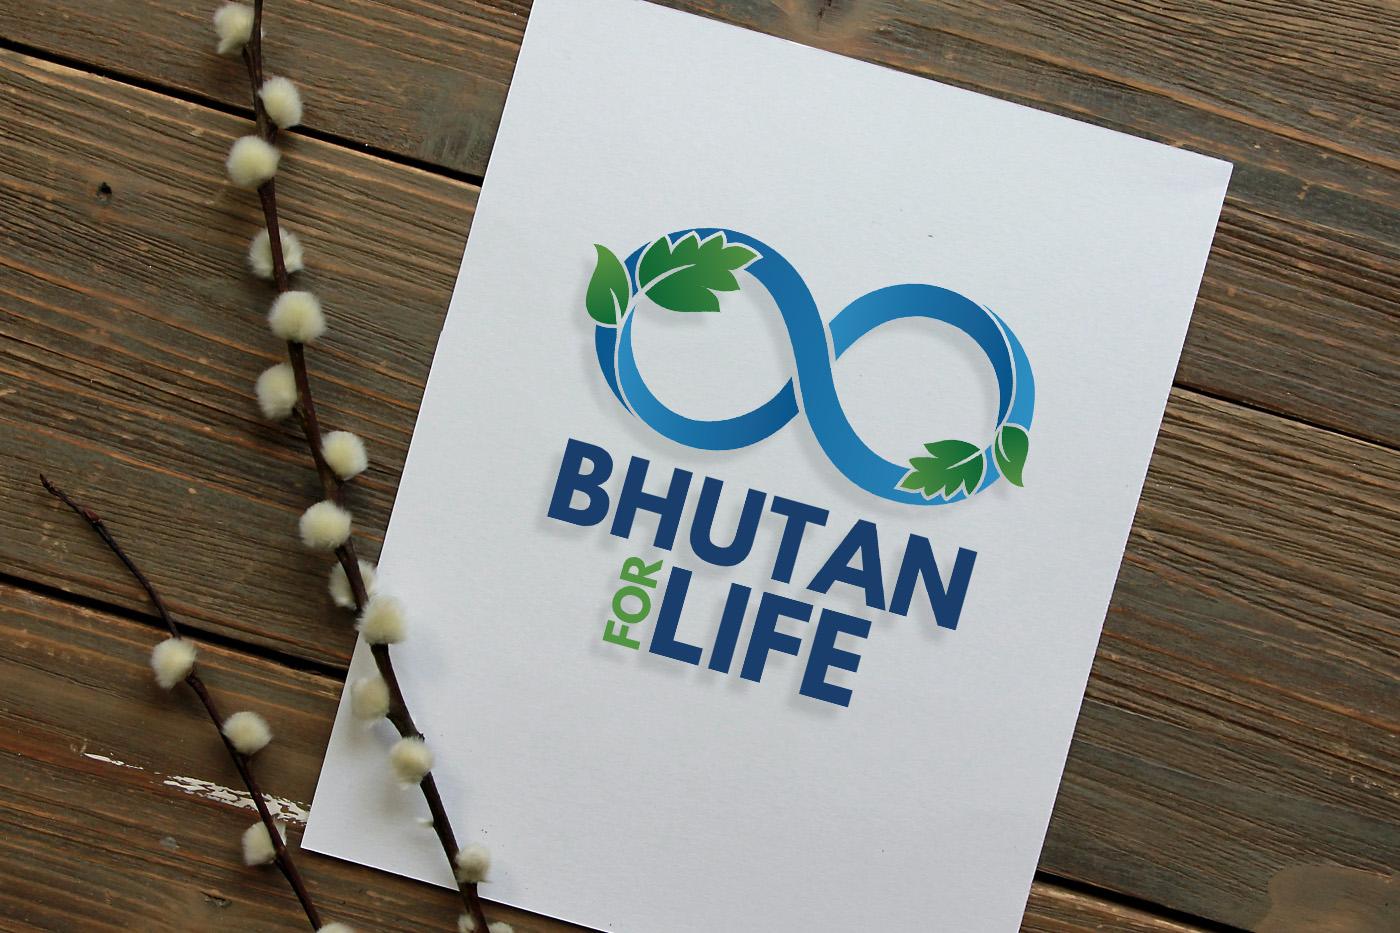 Bhutan for Life brand